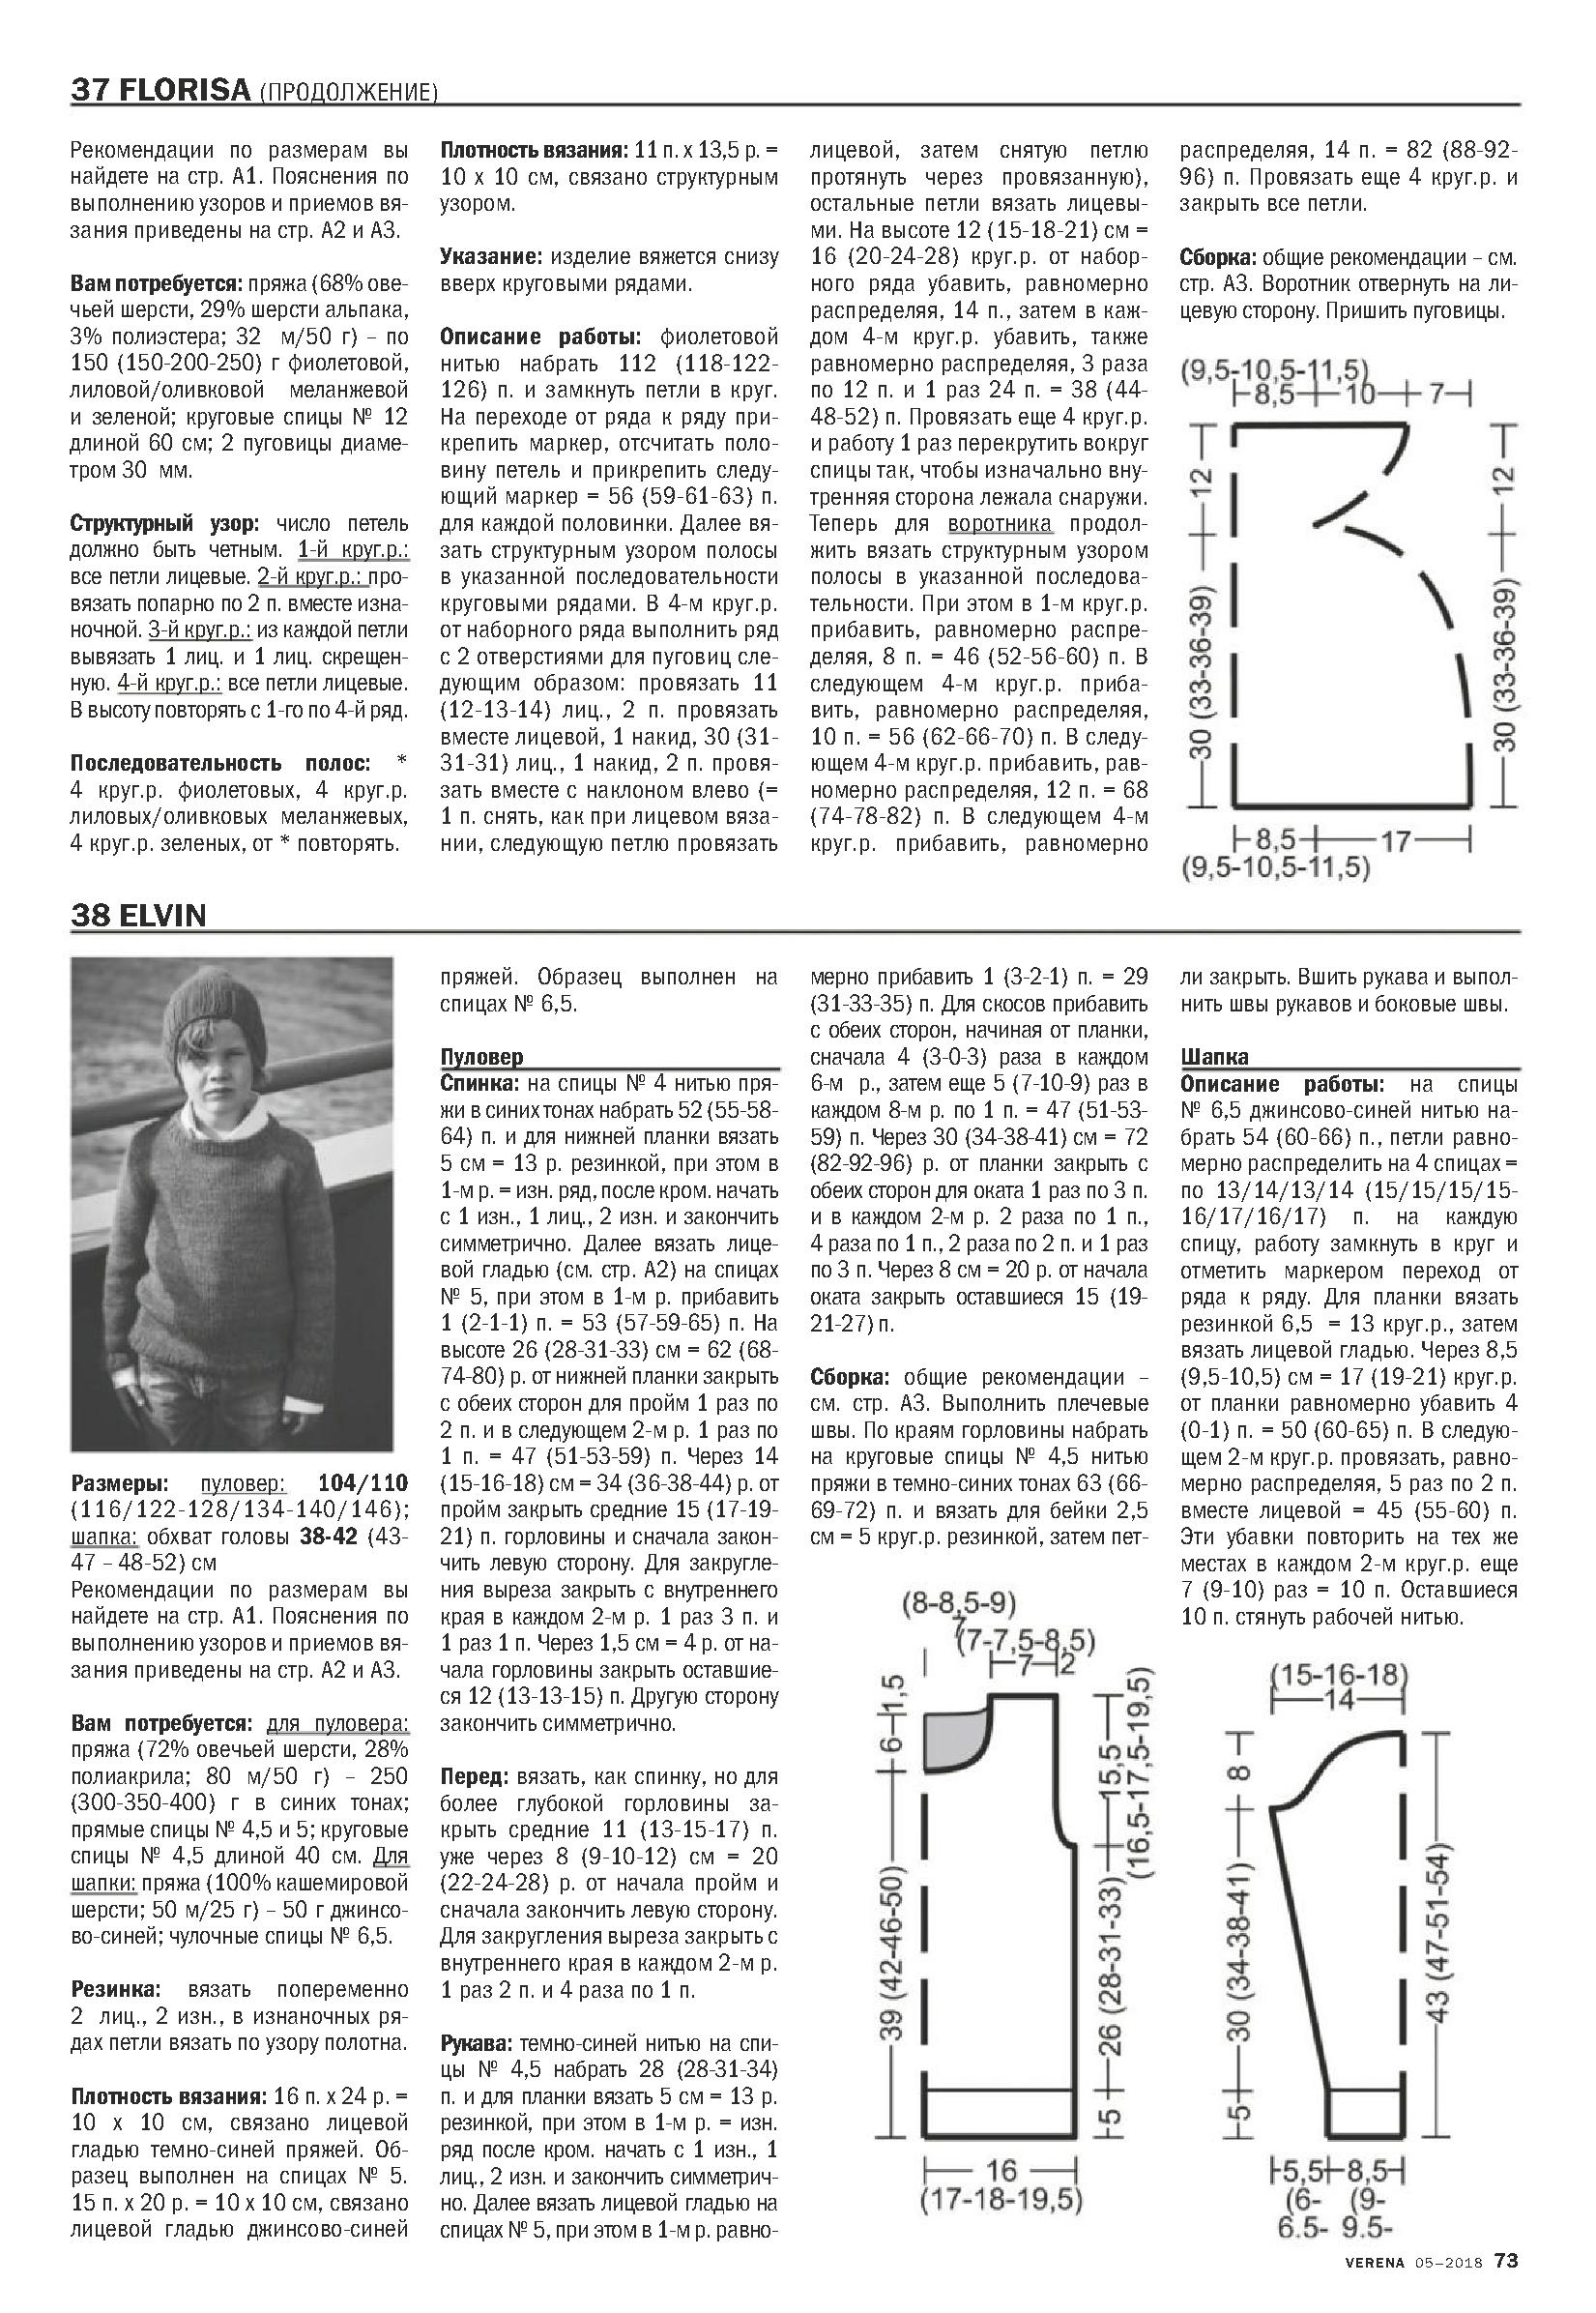 Page_00074.jpg